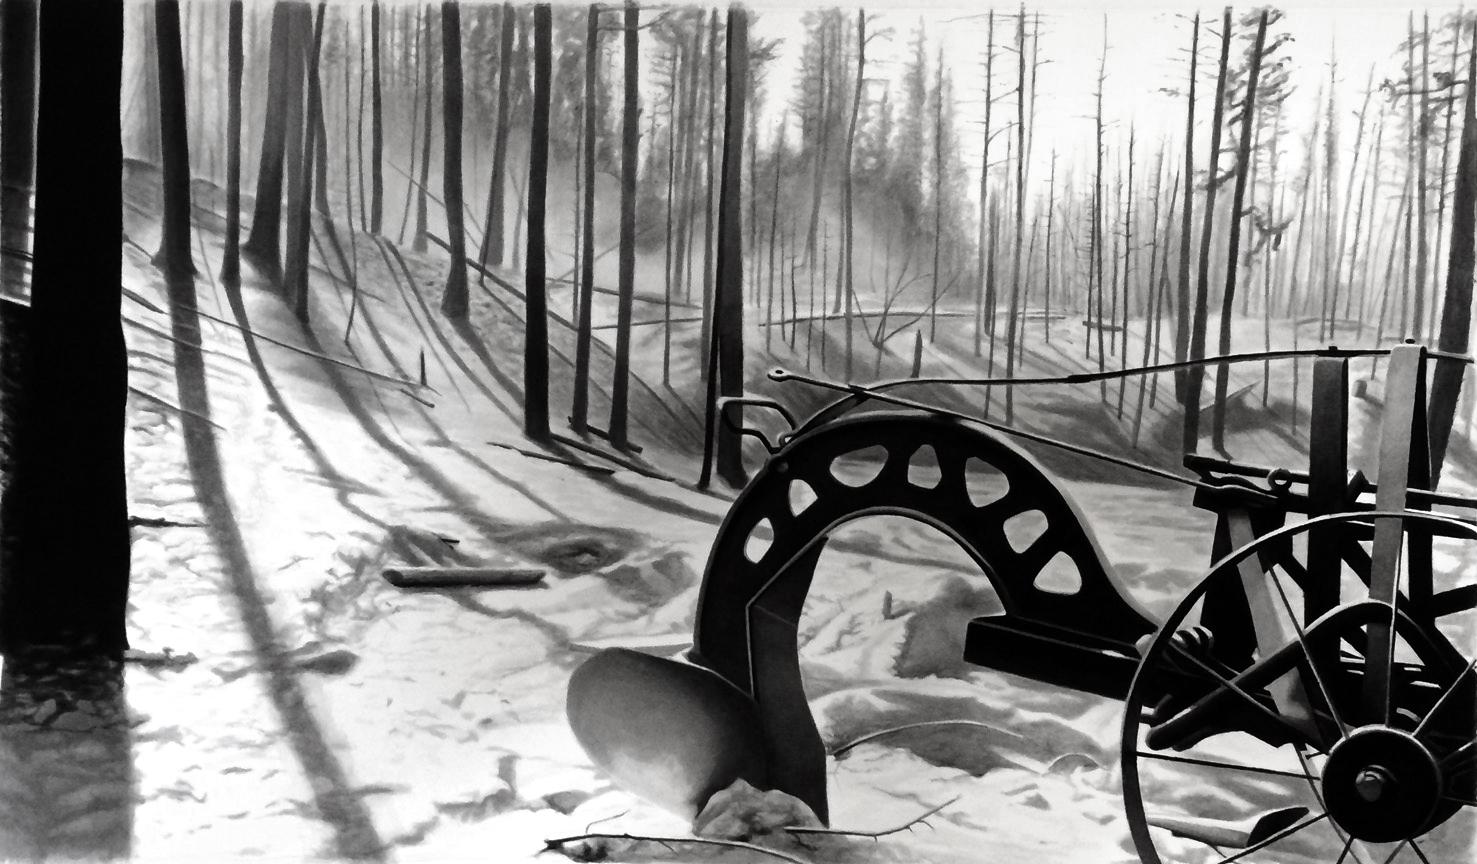 Erik Kihlbaum, Butter Creek Fire, 2015, Ink wash on paper, 40.5 x 69 cm